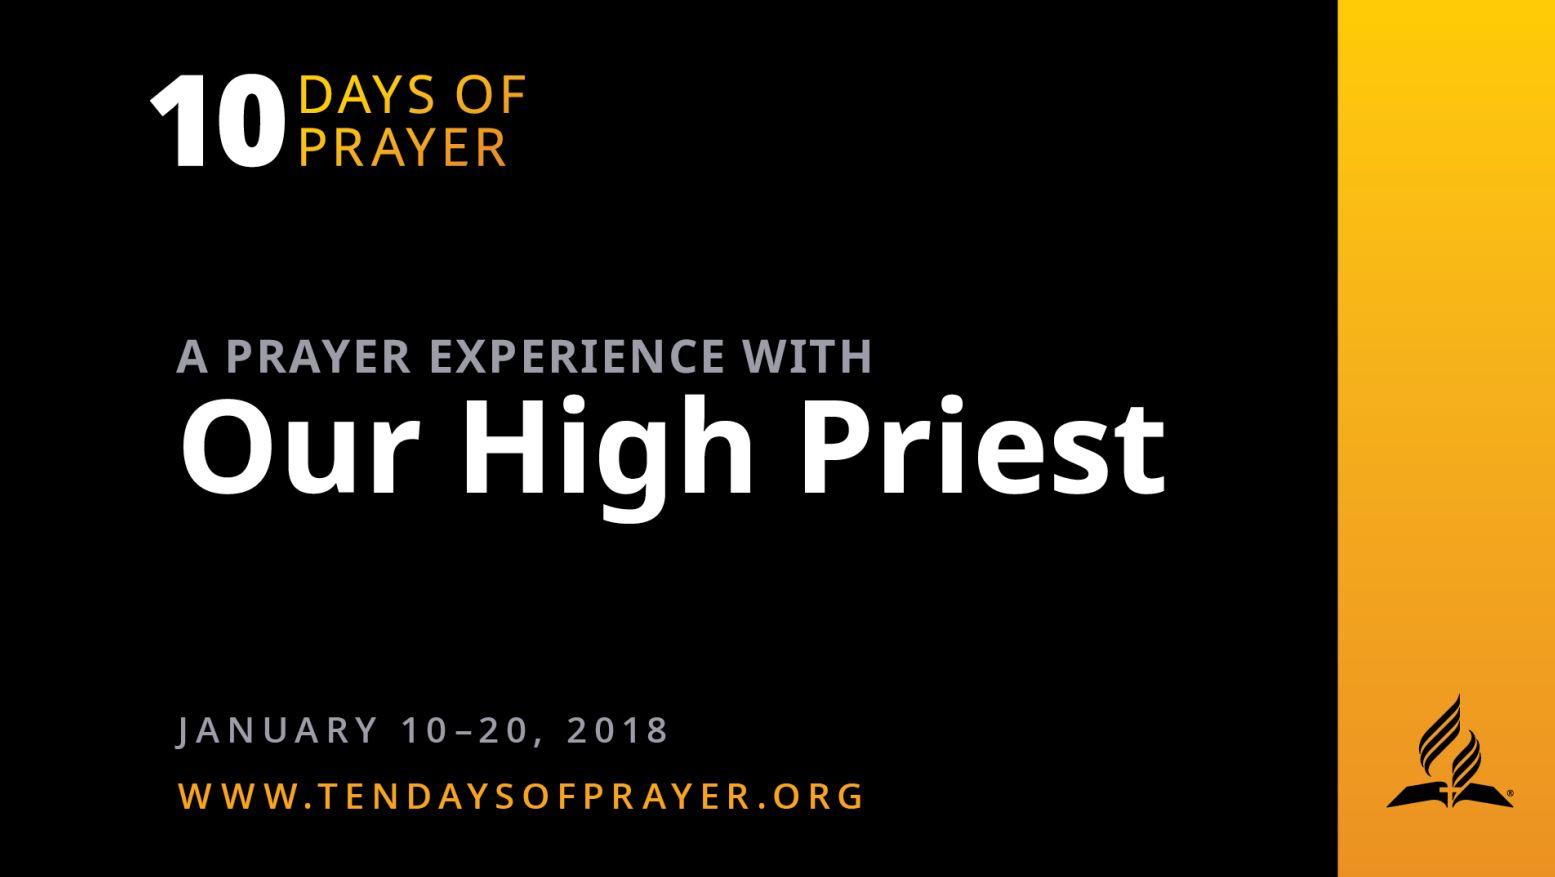 Ten Days of Prayer 2018